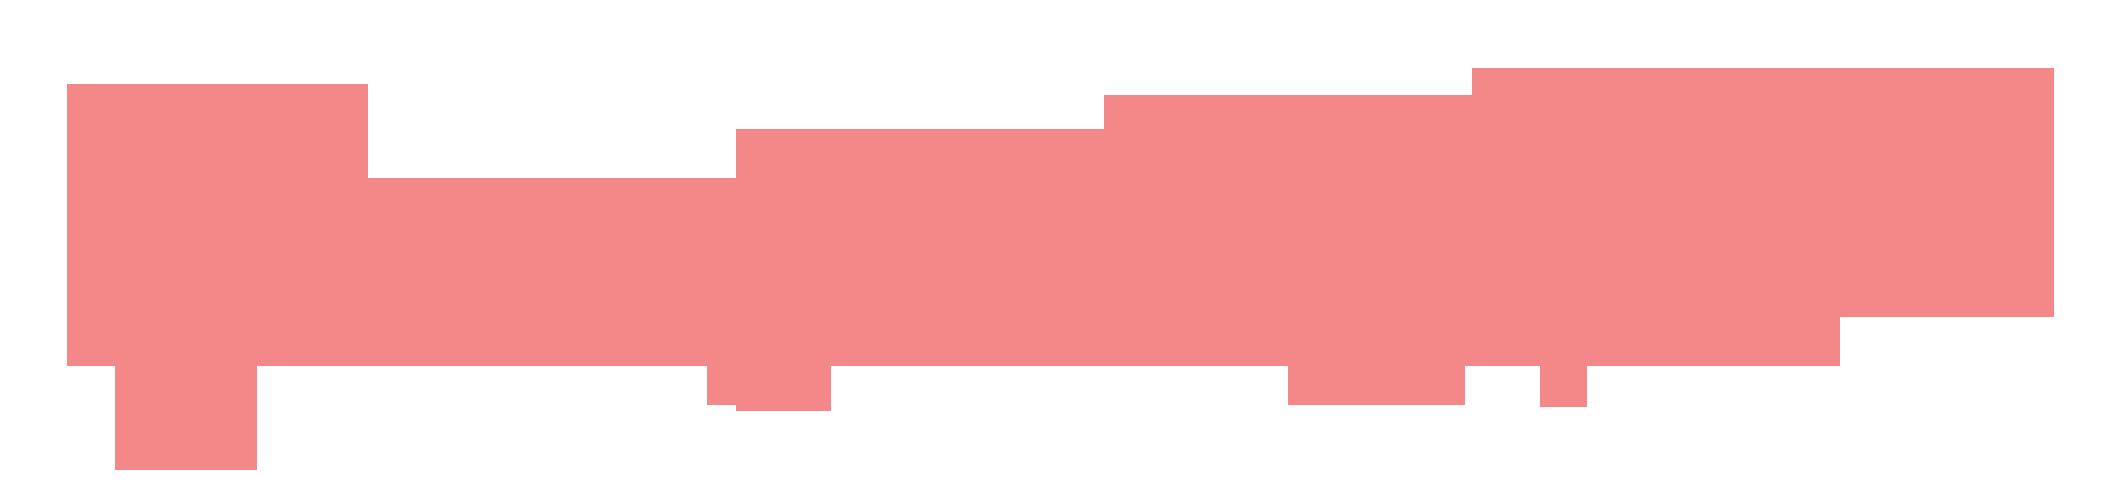 giorgia-rosa